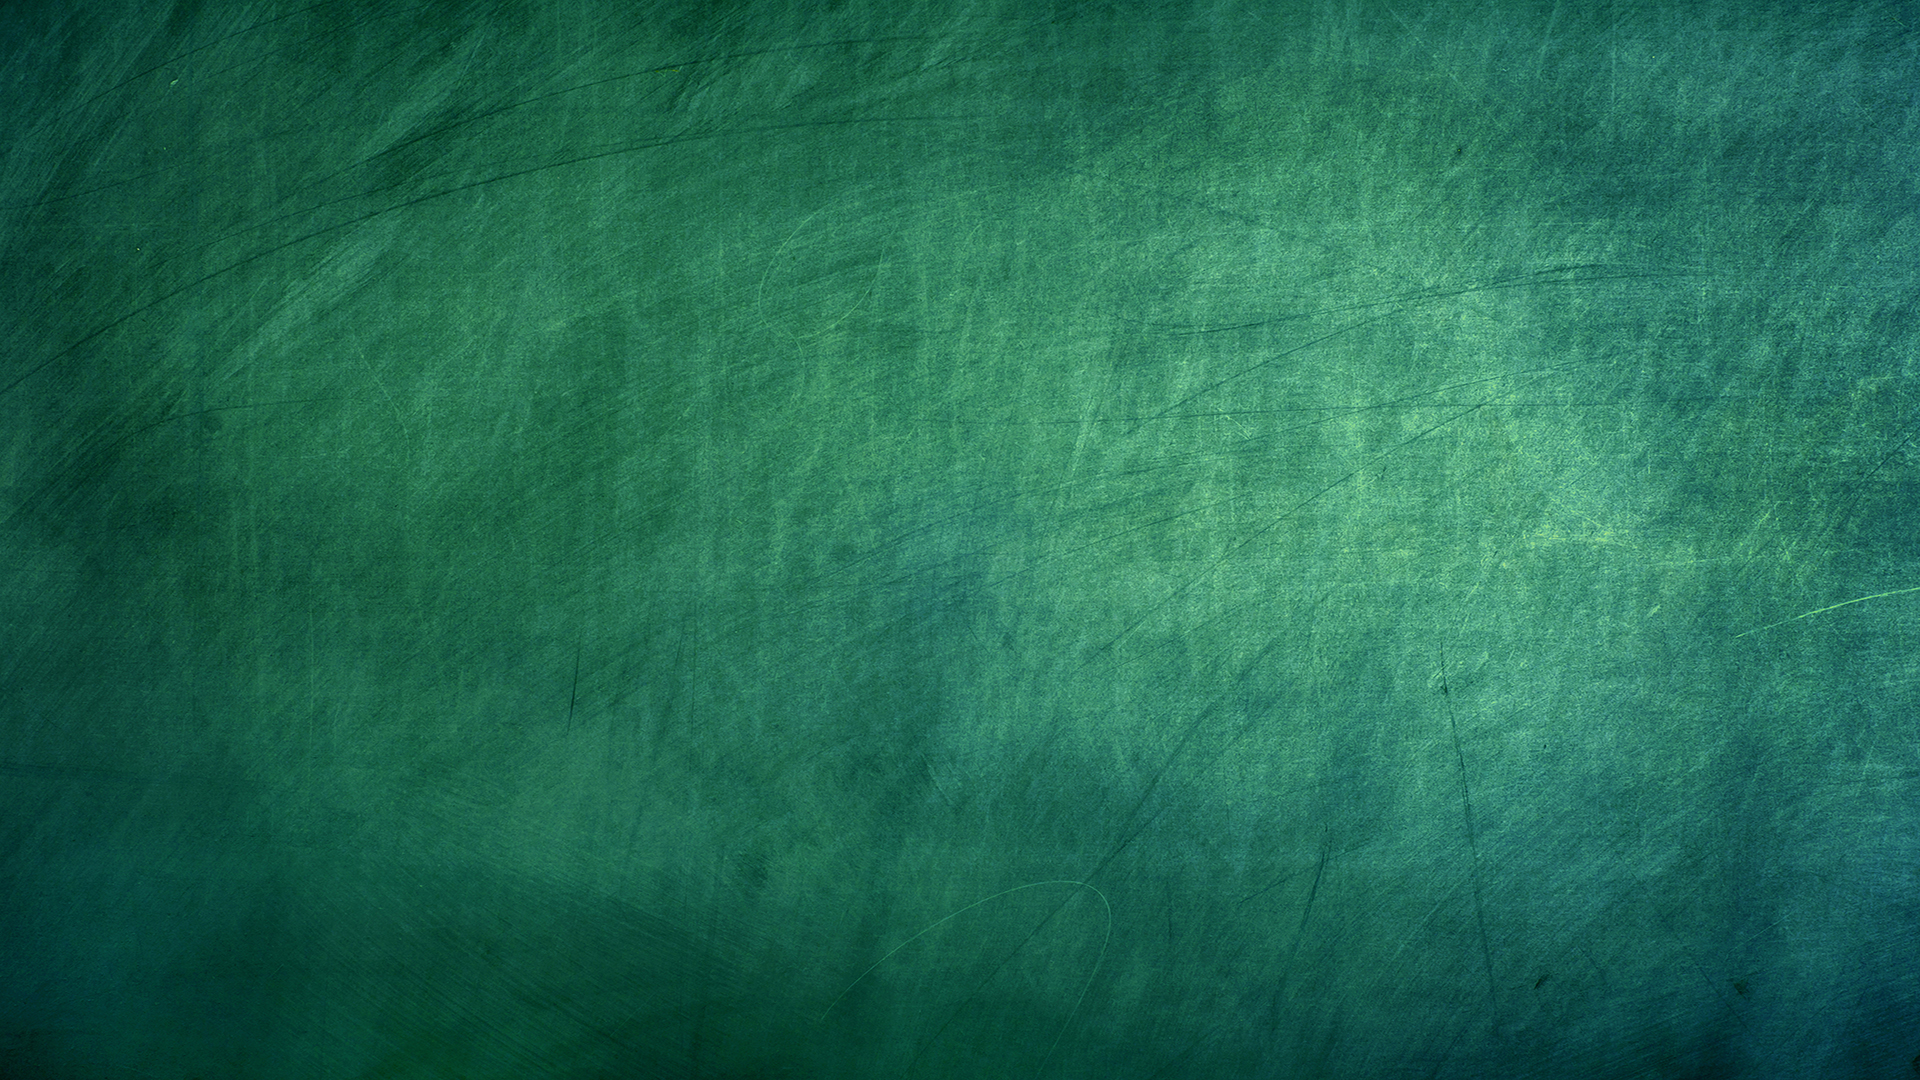 Chalkboards Hd Download PPT Backgrounds